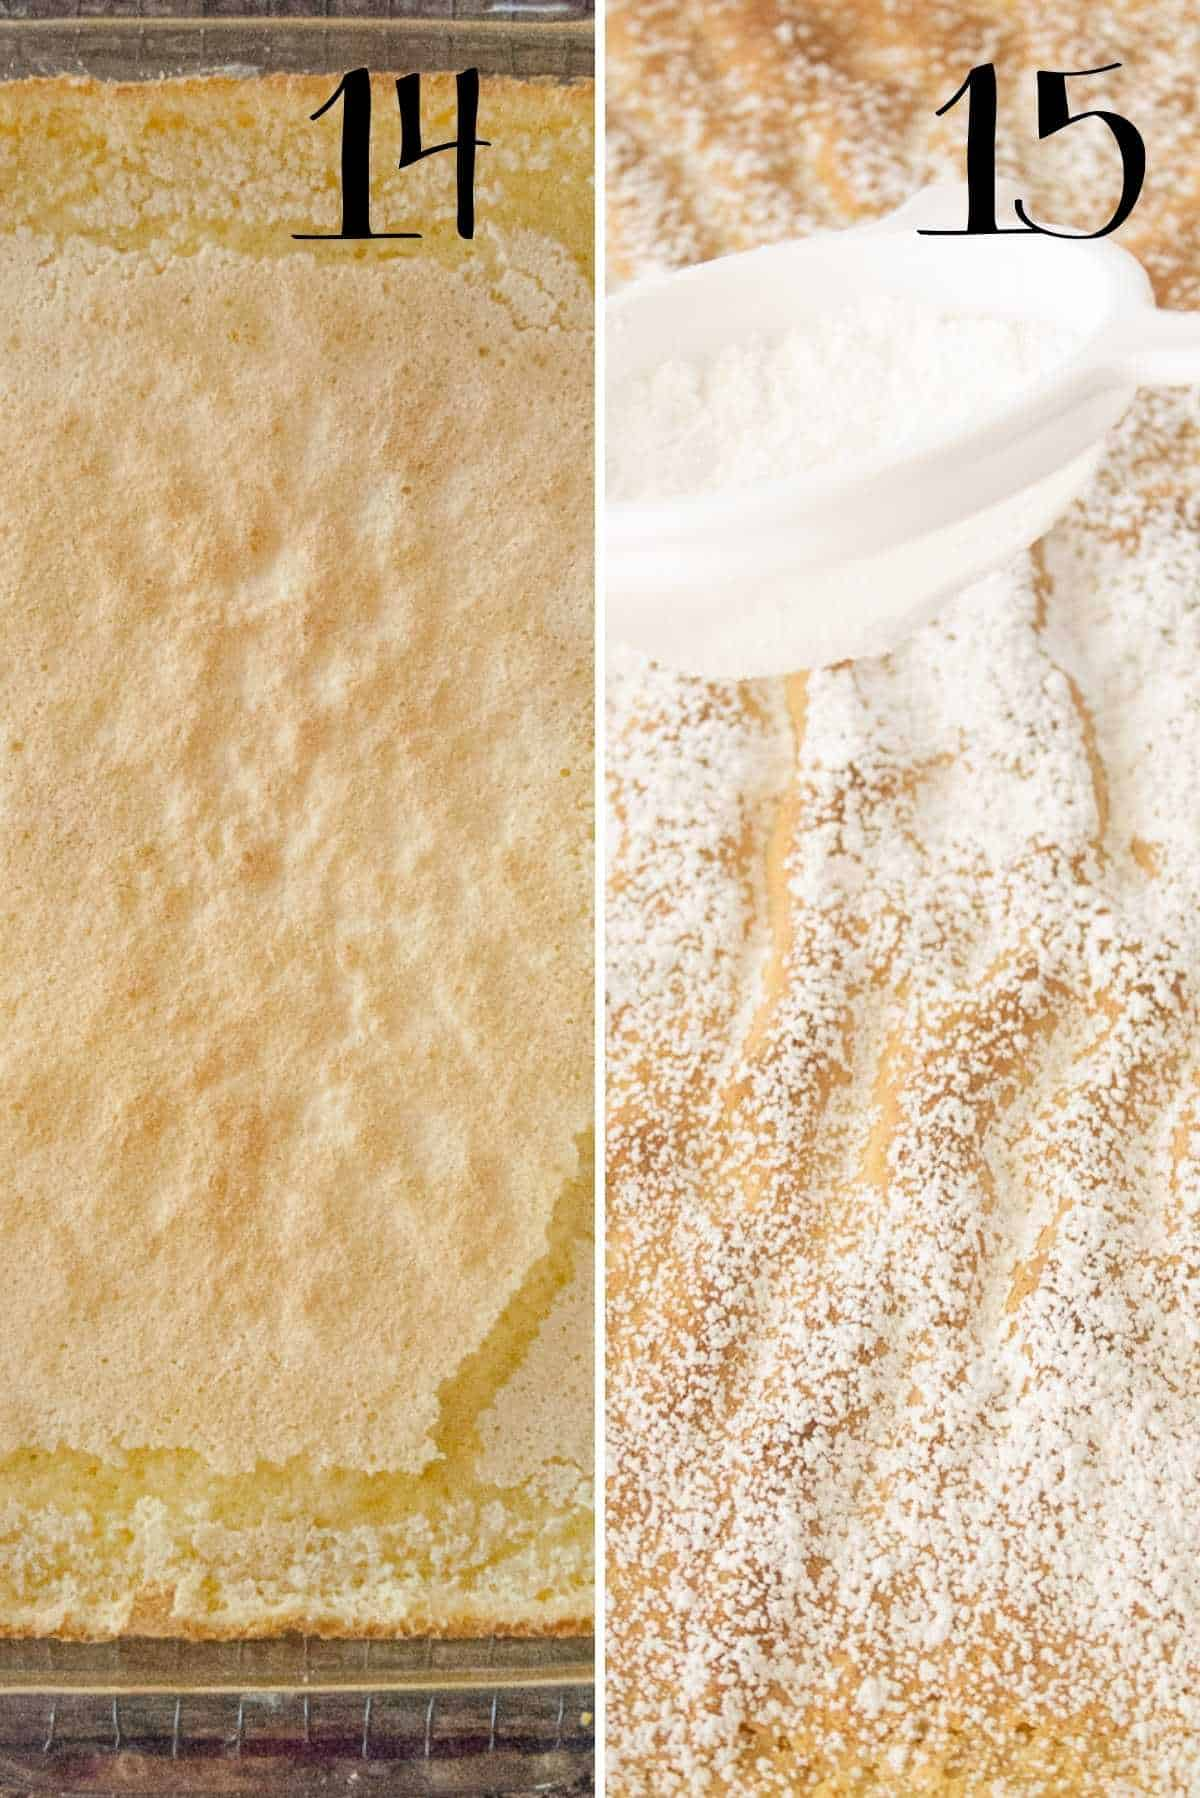 Sprinkle baked lemon bars with powdered sugar.